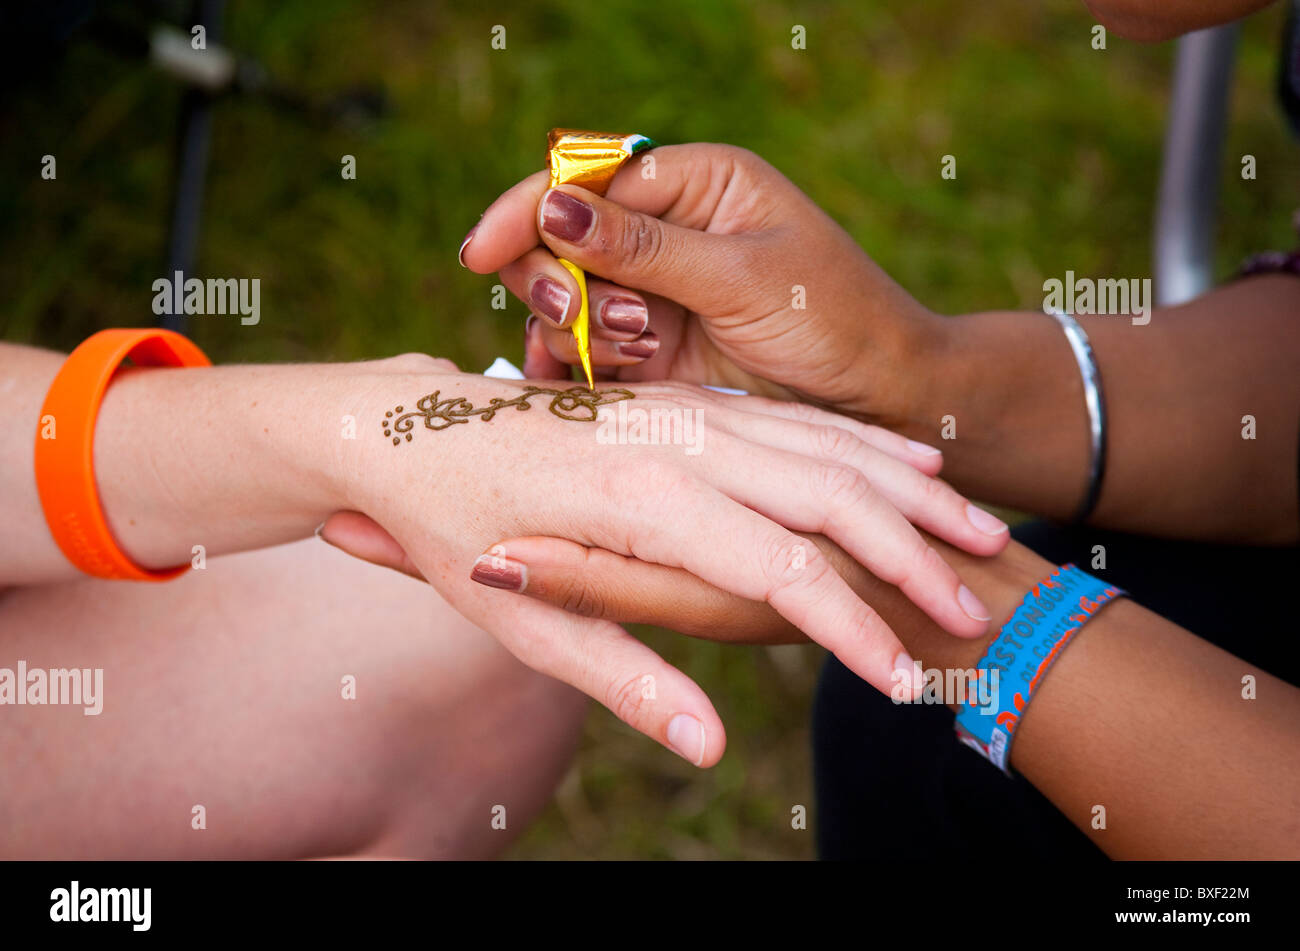 Henna Tattoo Stock Photos & Henna Tattoo Stock Images - Alamy